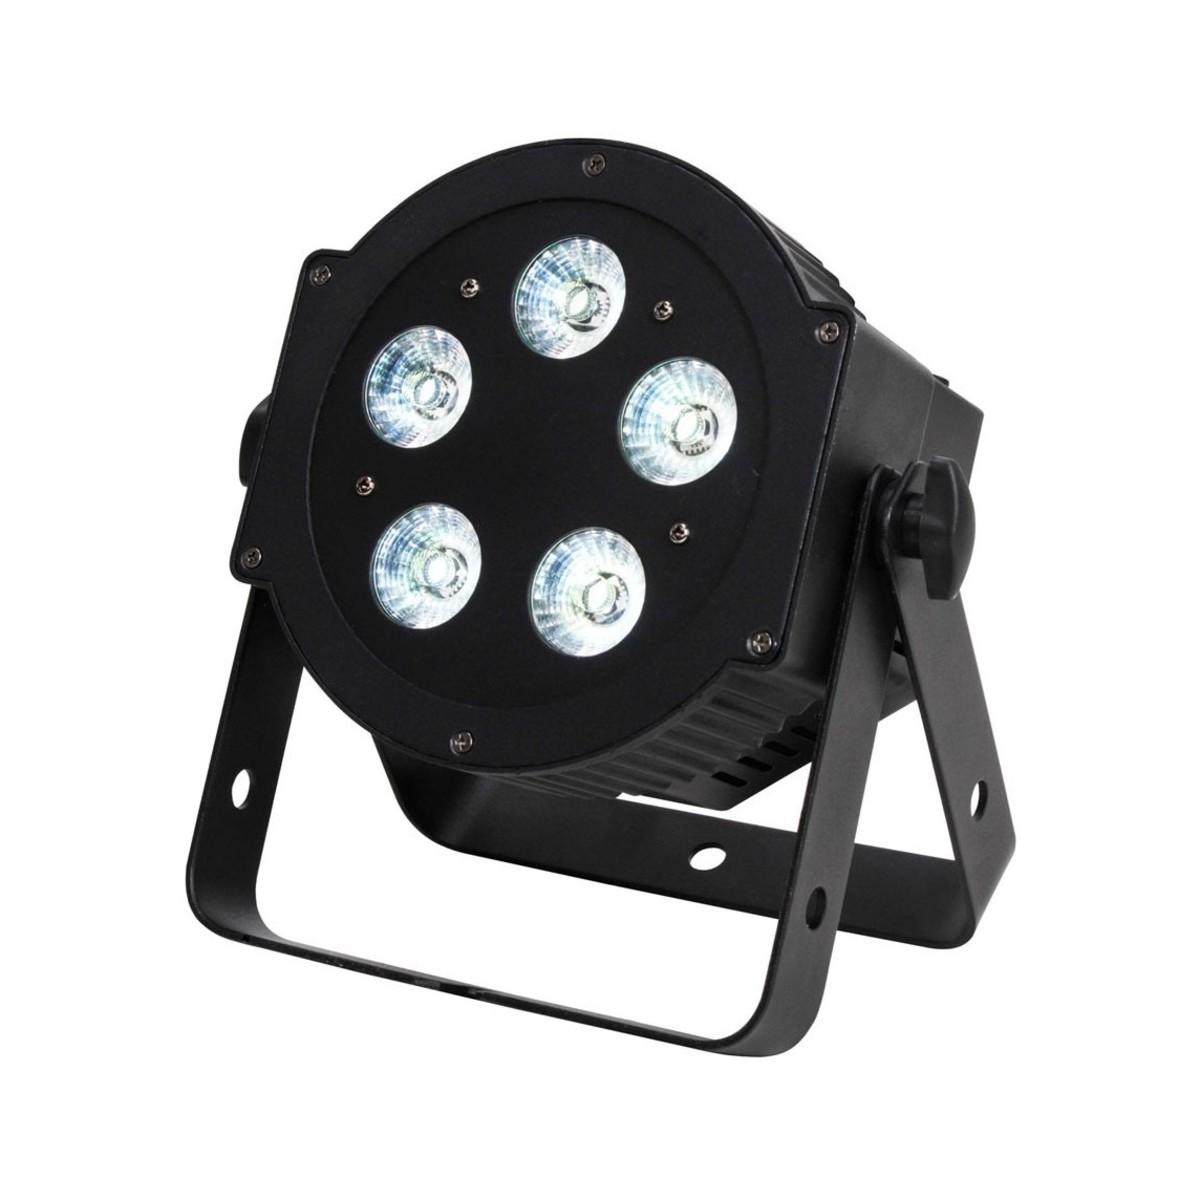 Image of ADJ 5P Hex LED Par Can